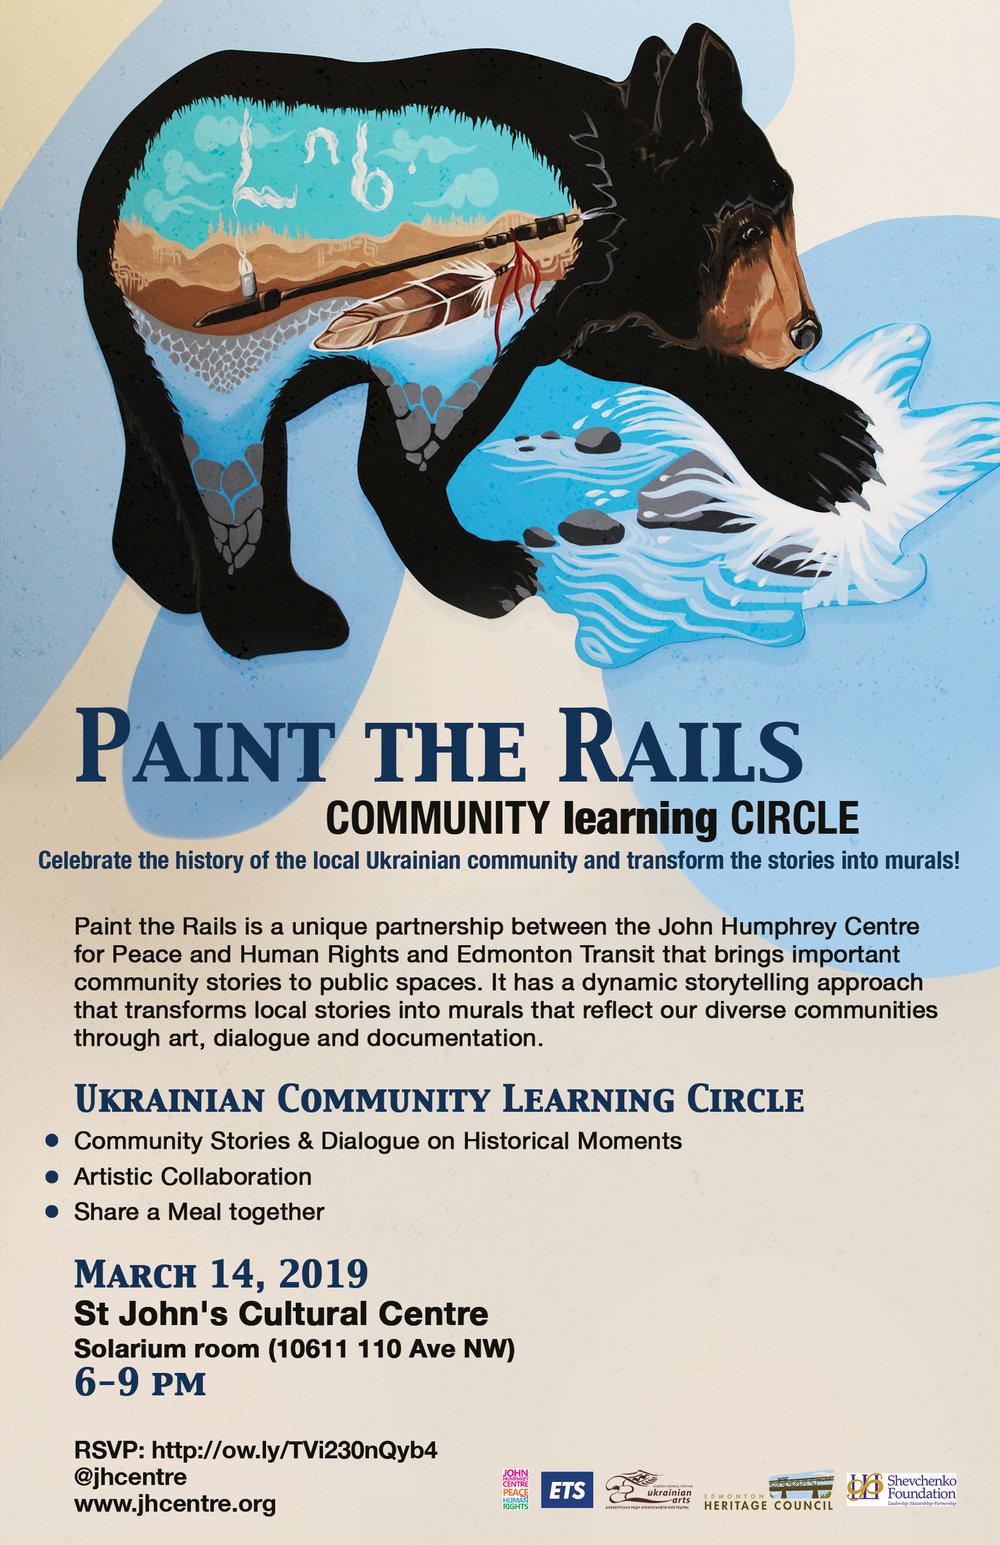 CommunityCircles-PtR-UkrainianCommunity-Final.jpg